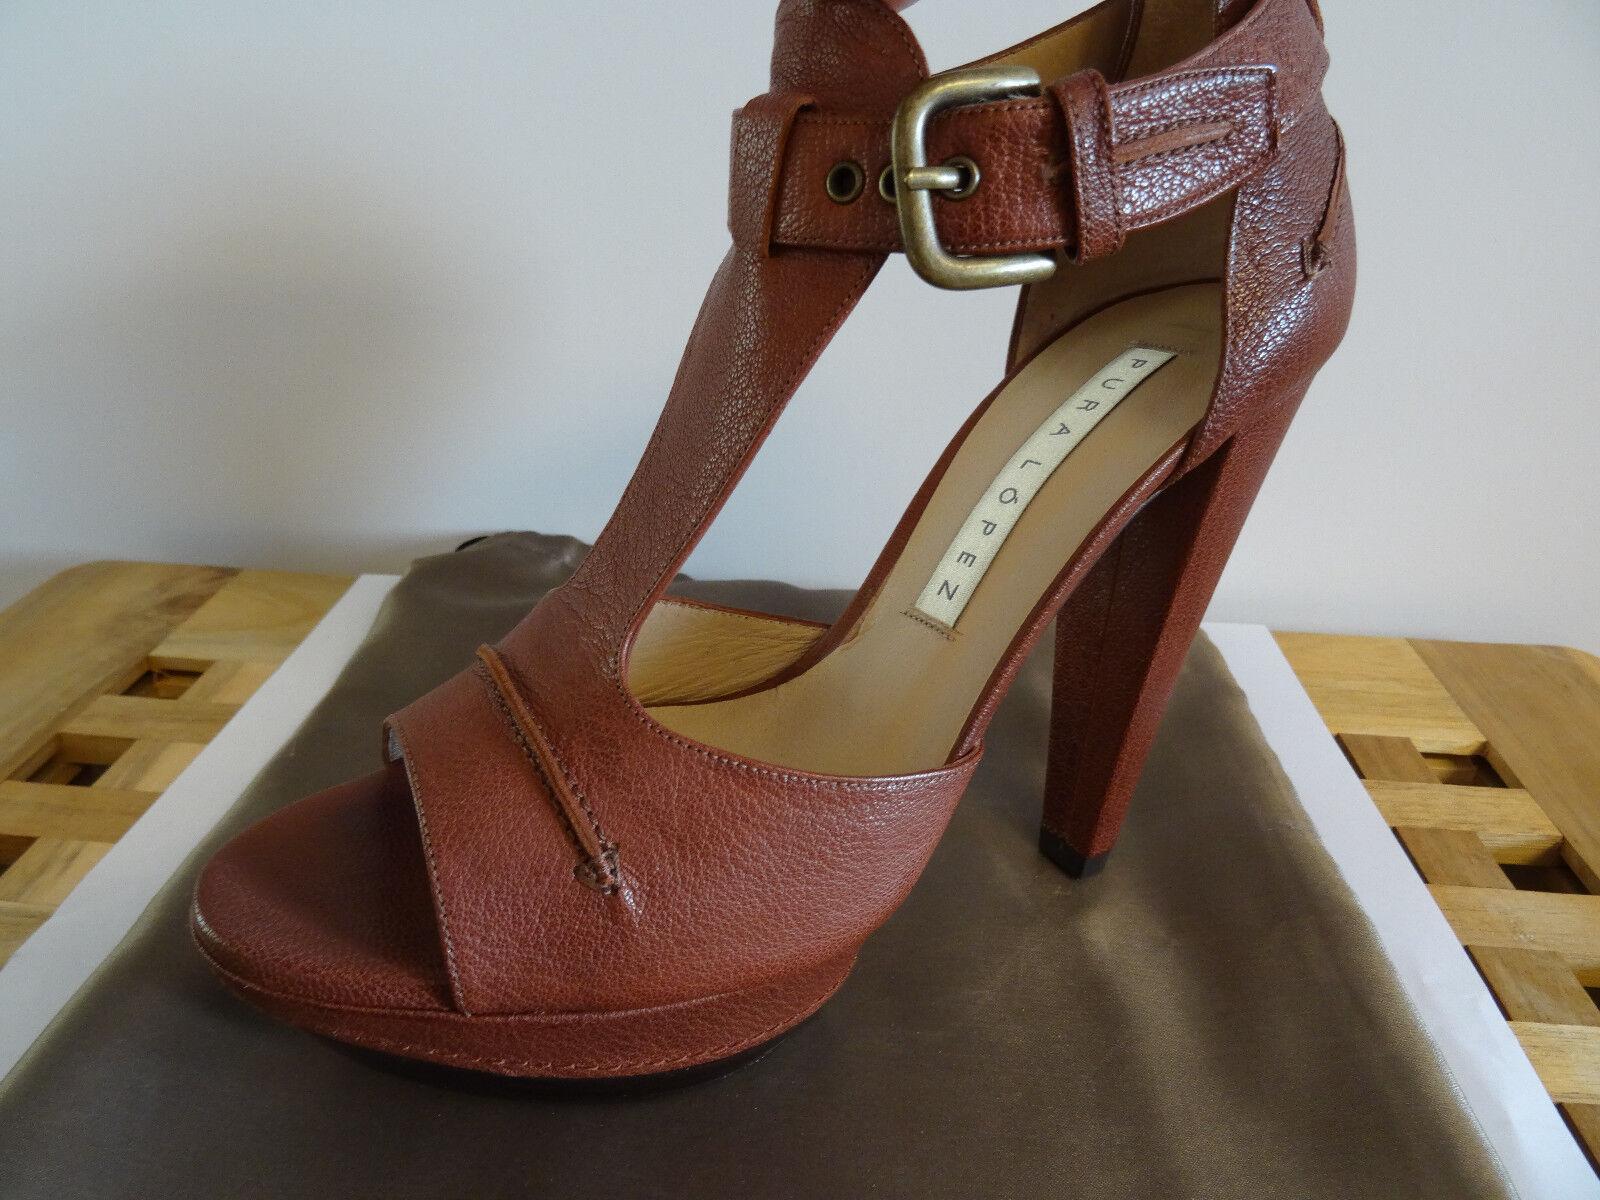 PURA LOPEZ Pumps High Heels Sandale braun Stiletto Ledersohle 37,5 - wie Neu